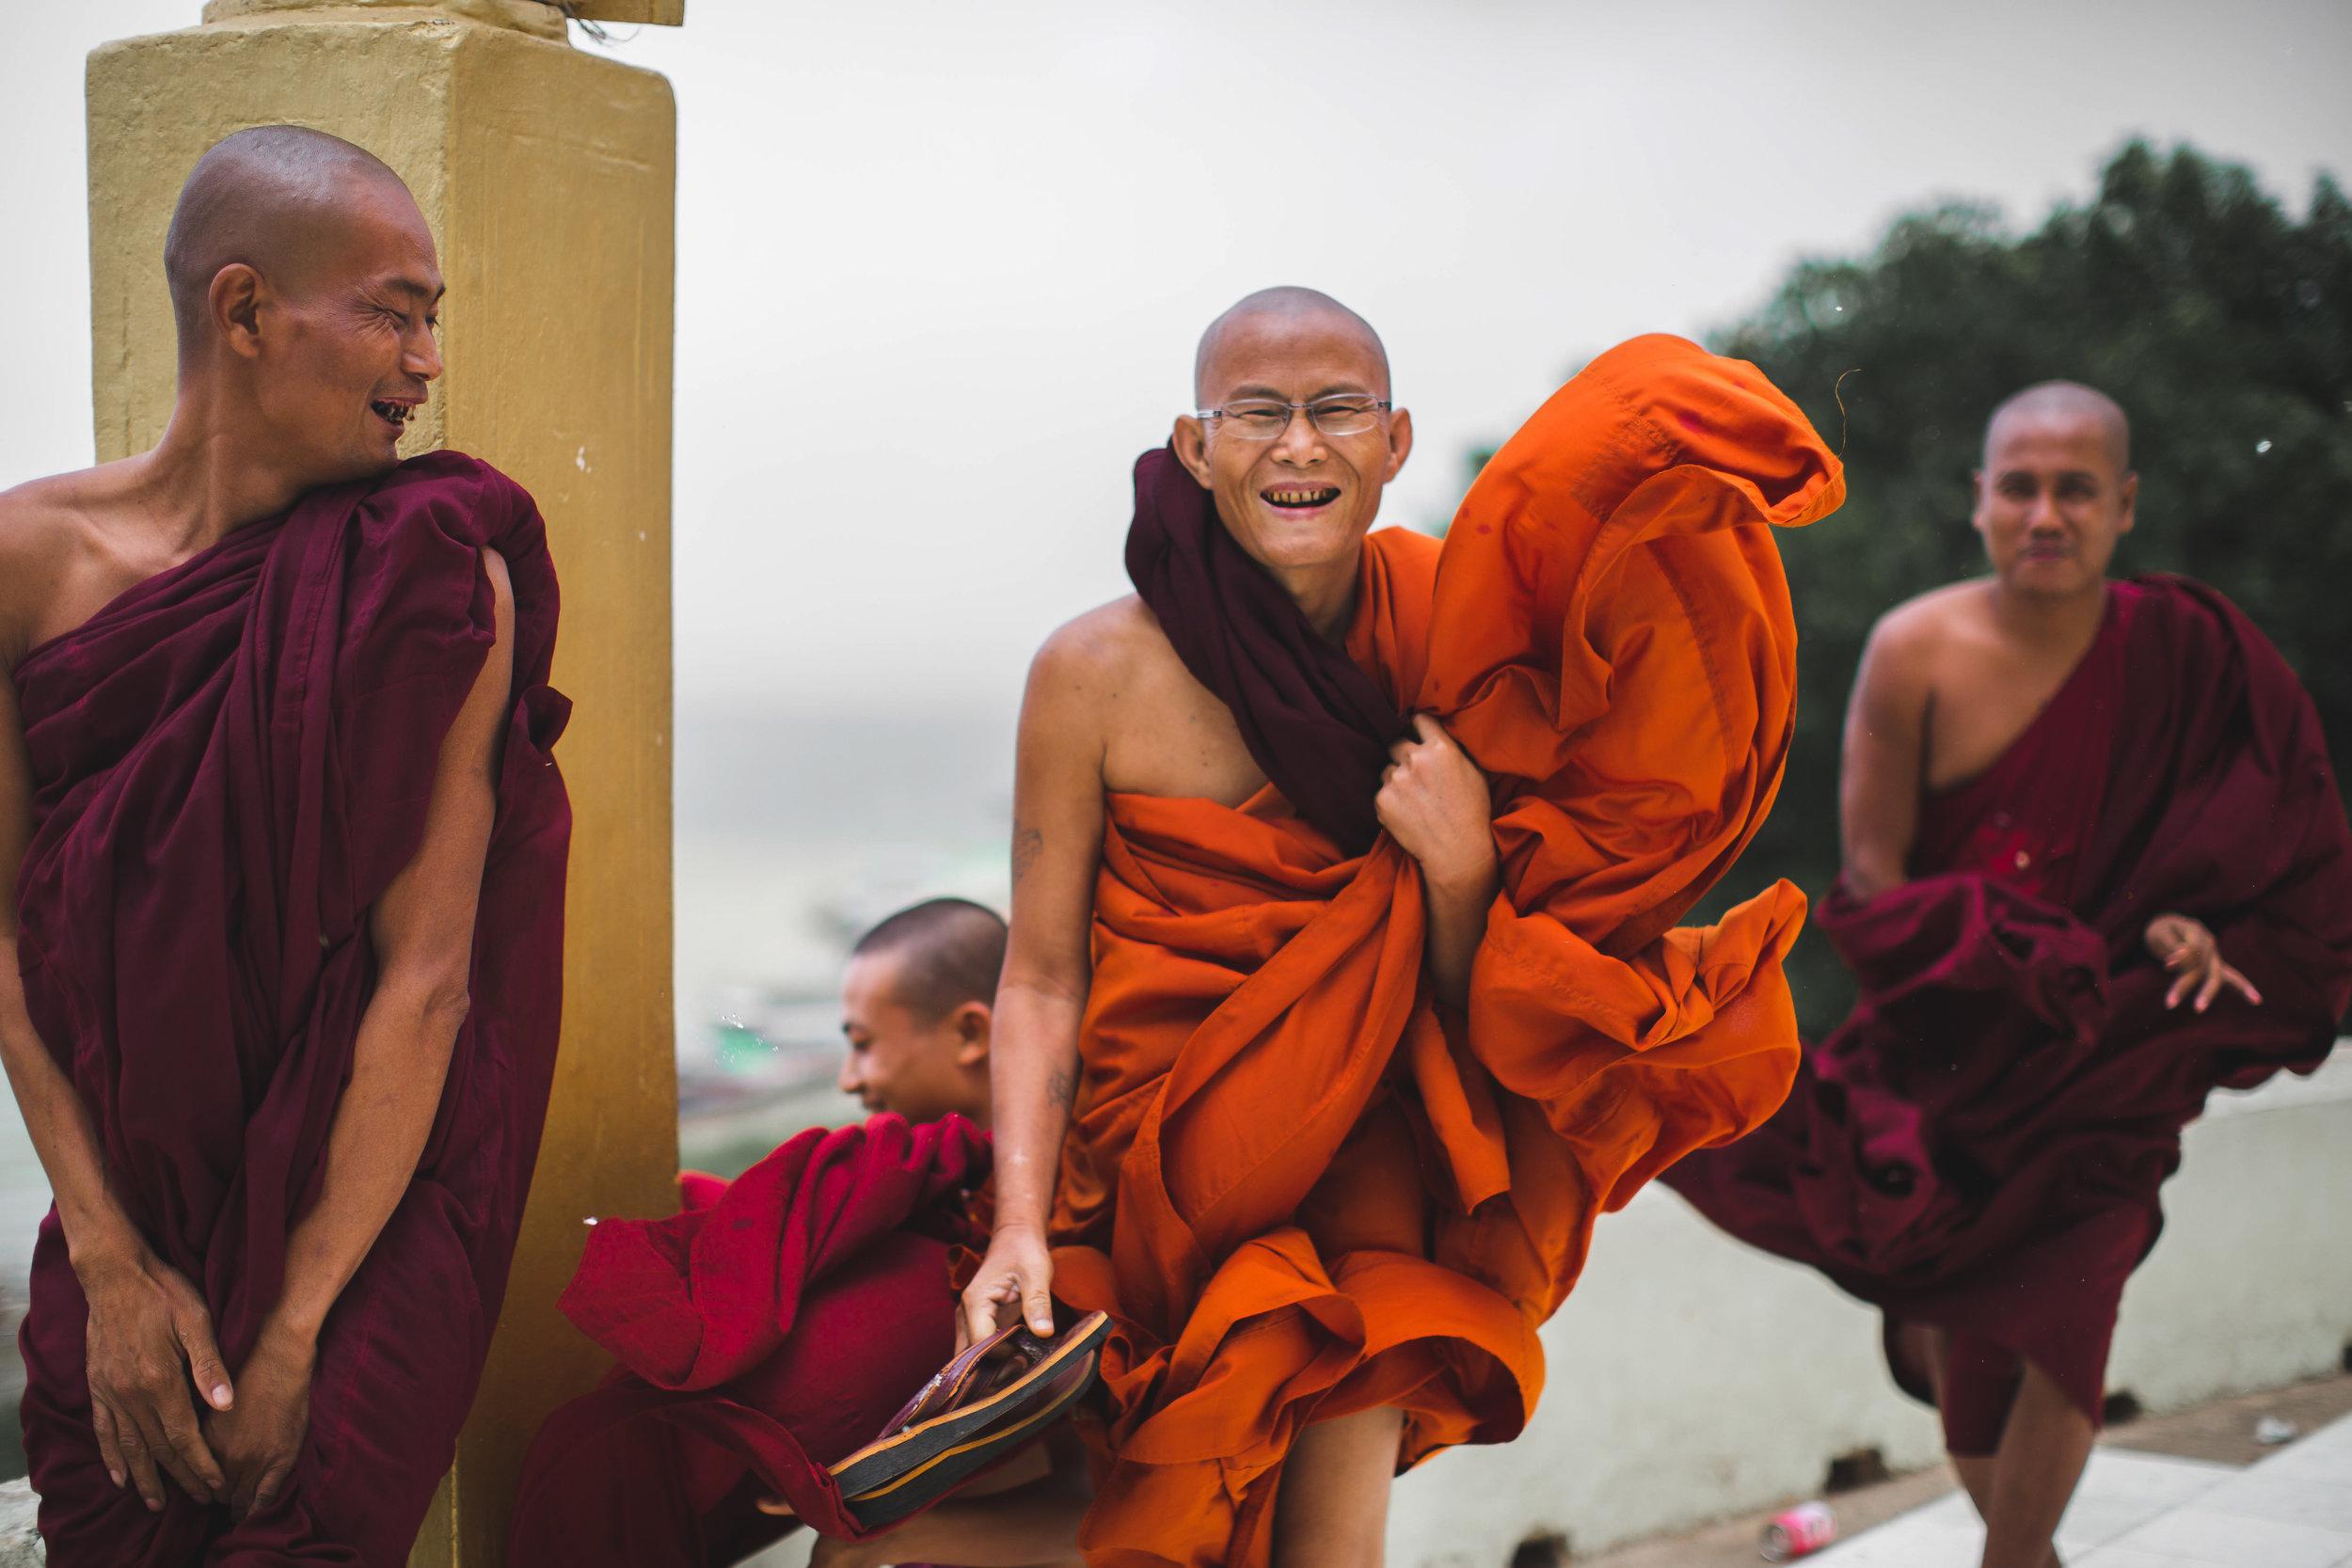 44AdamZiorioPhotography(MyanmarMonks)-2.jpg